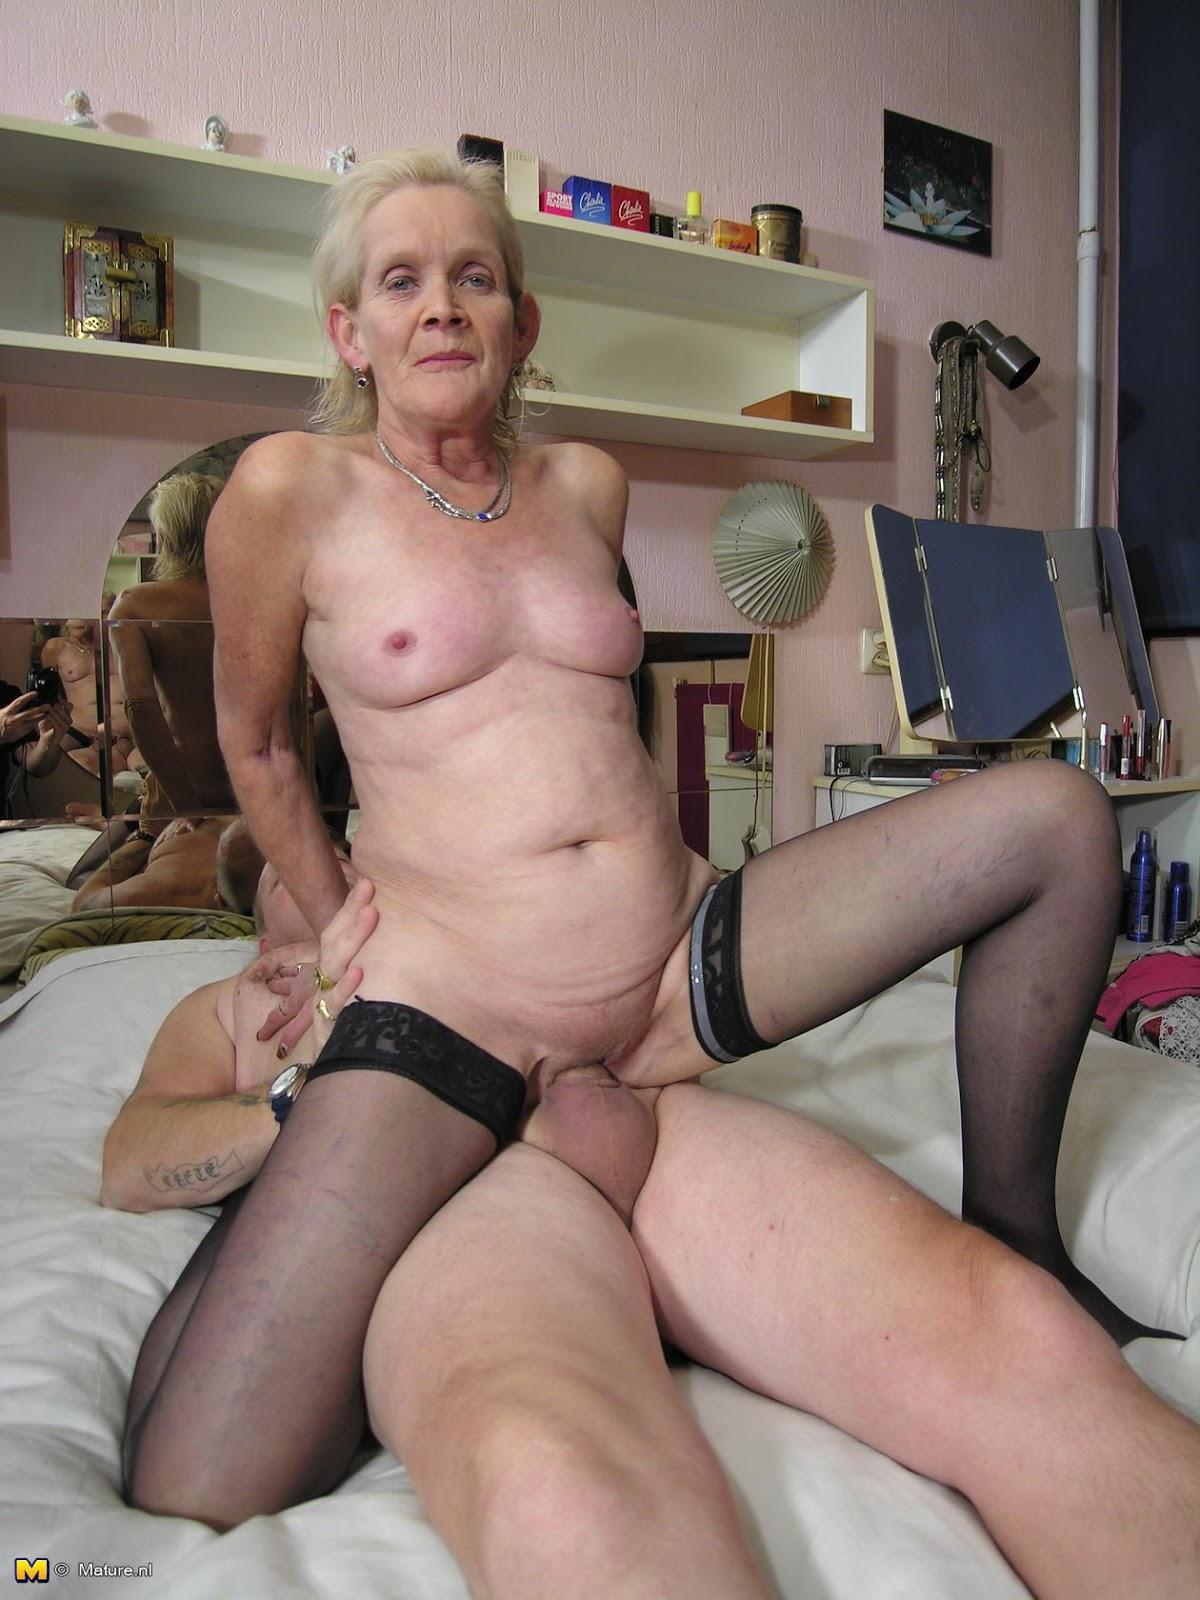 Bottle in pussy movie sapphic erotica